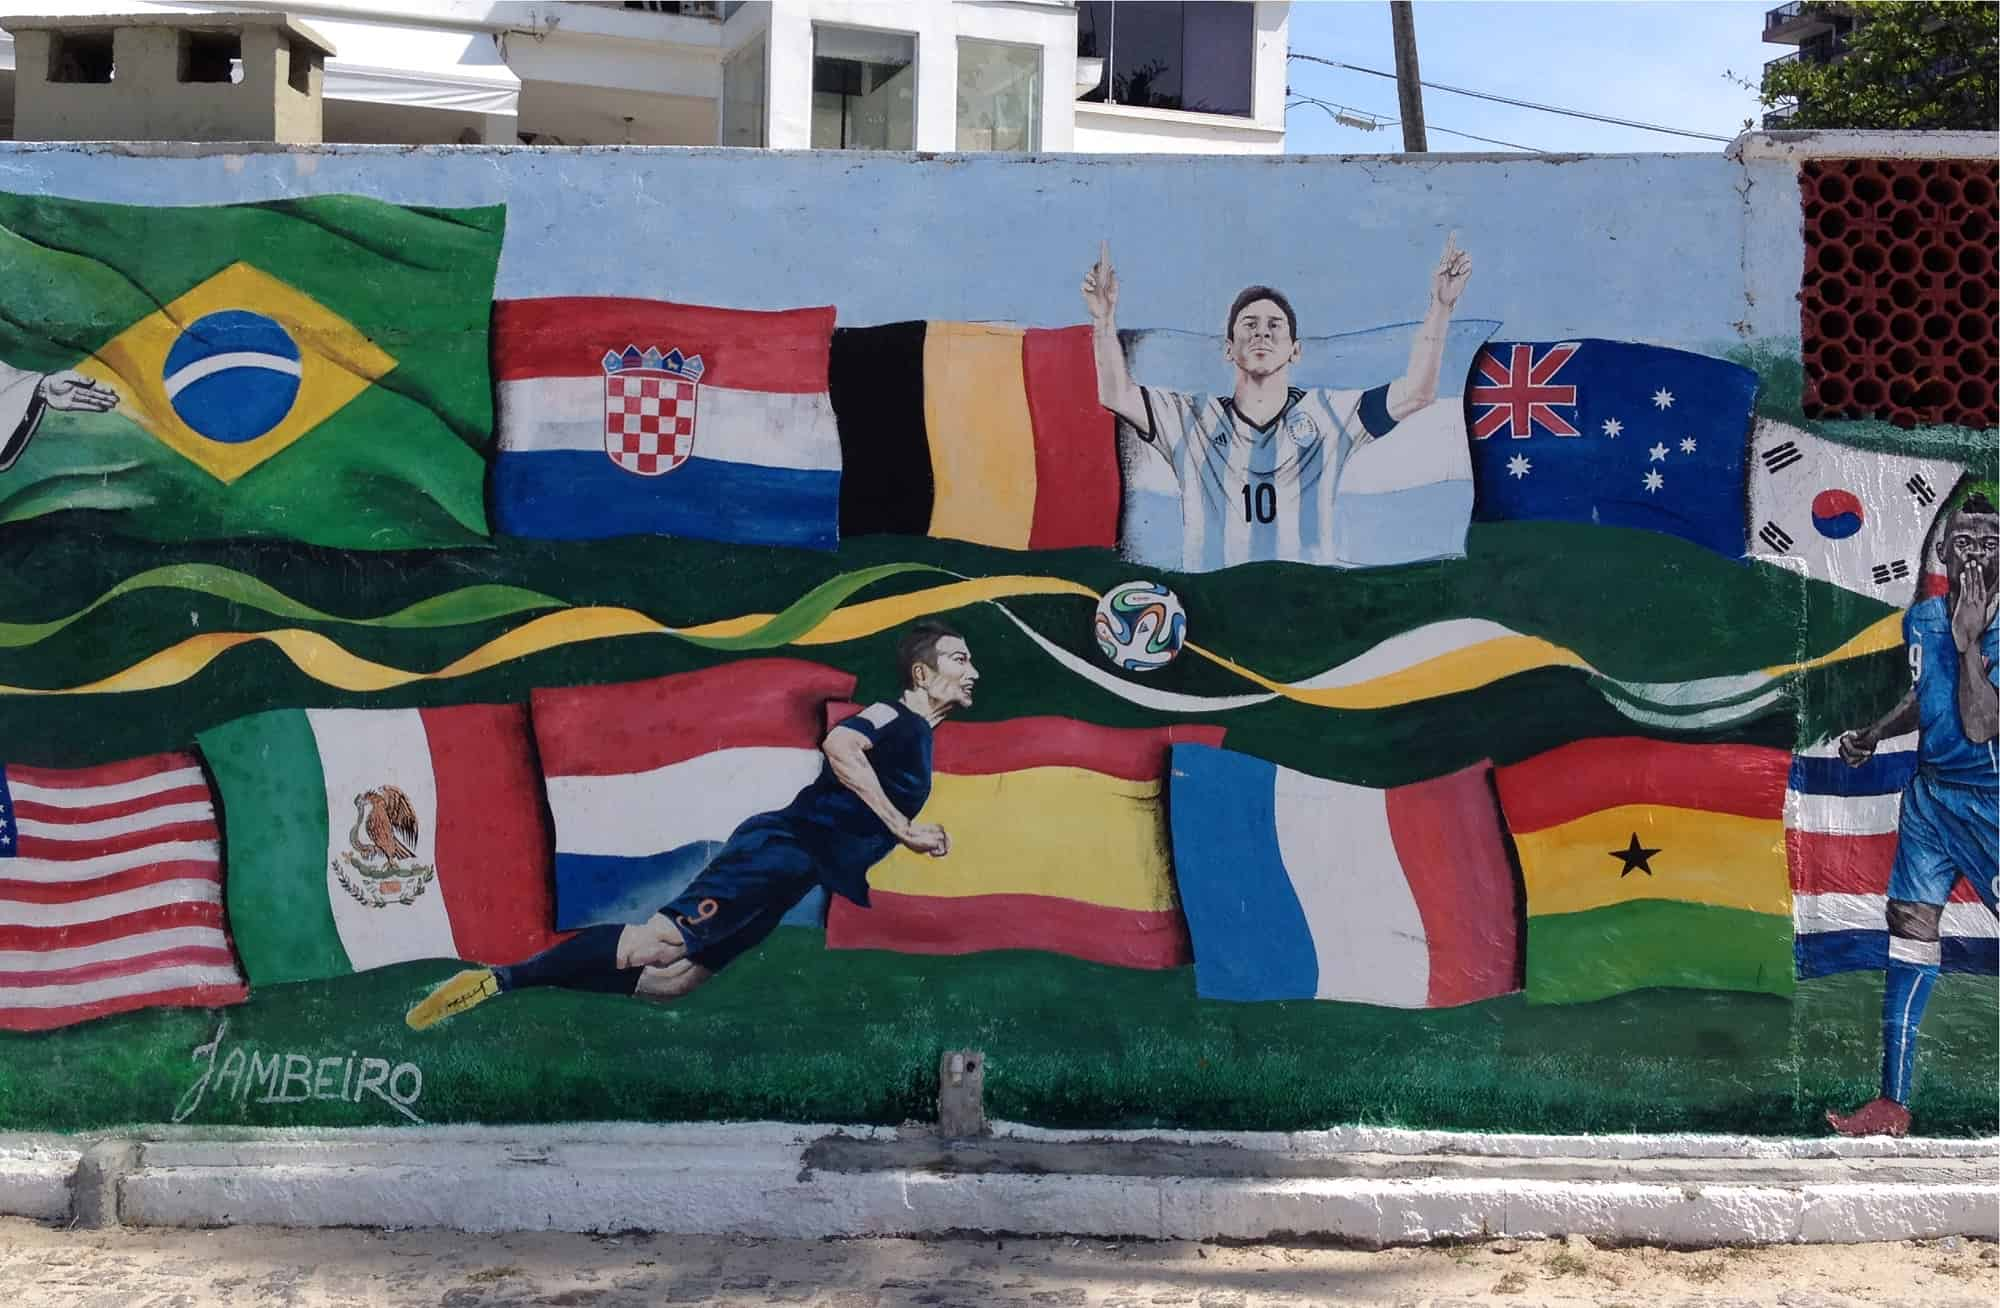 Brazilie Olympische spelen